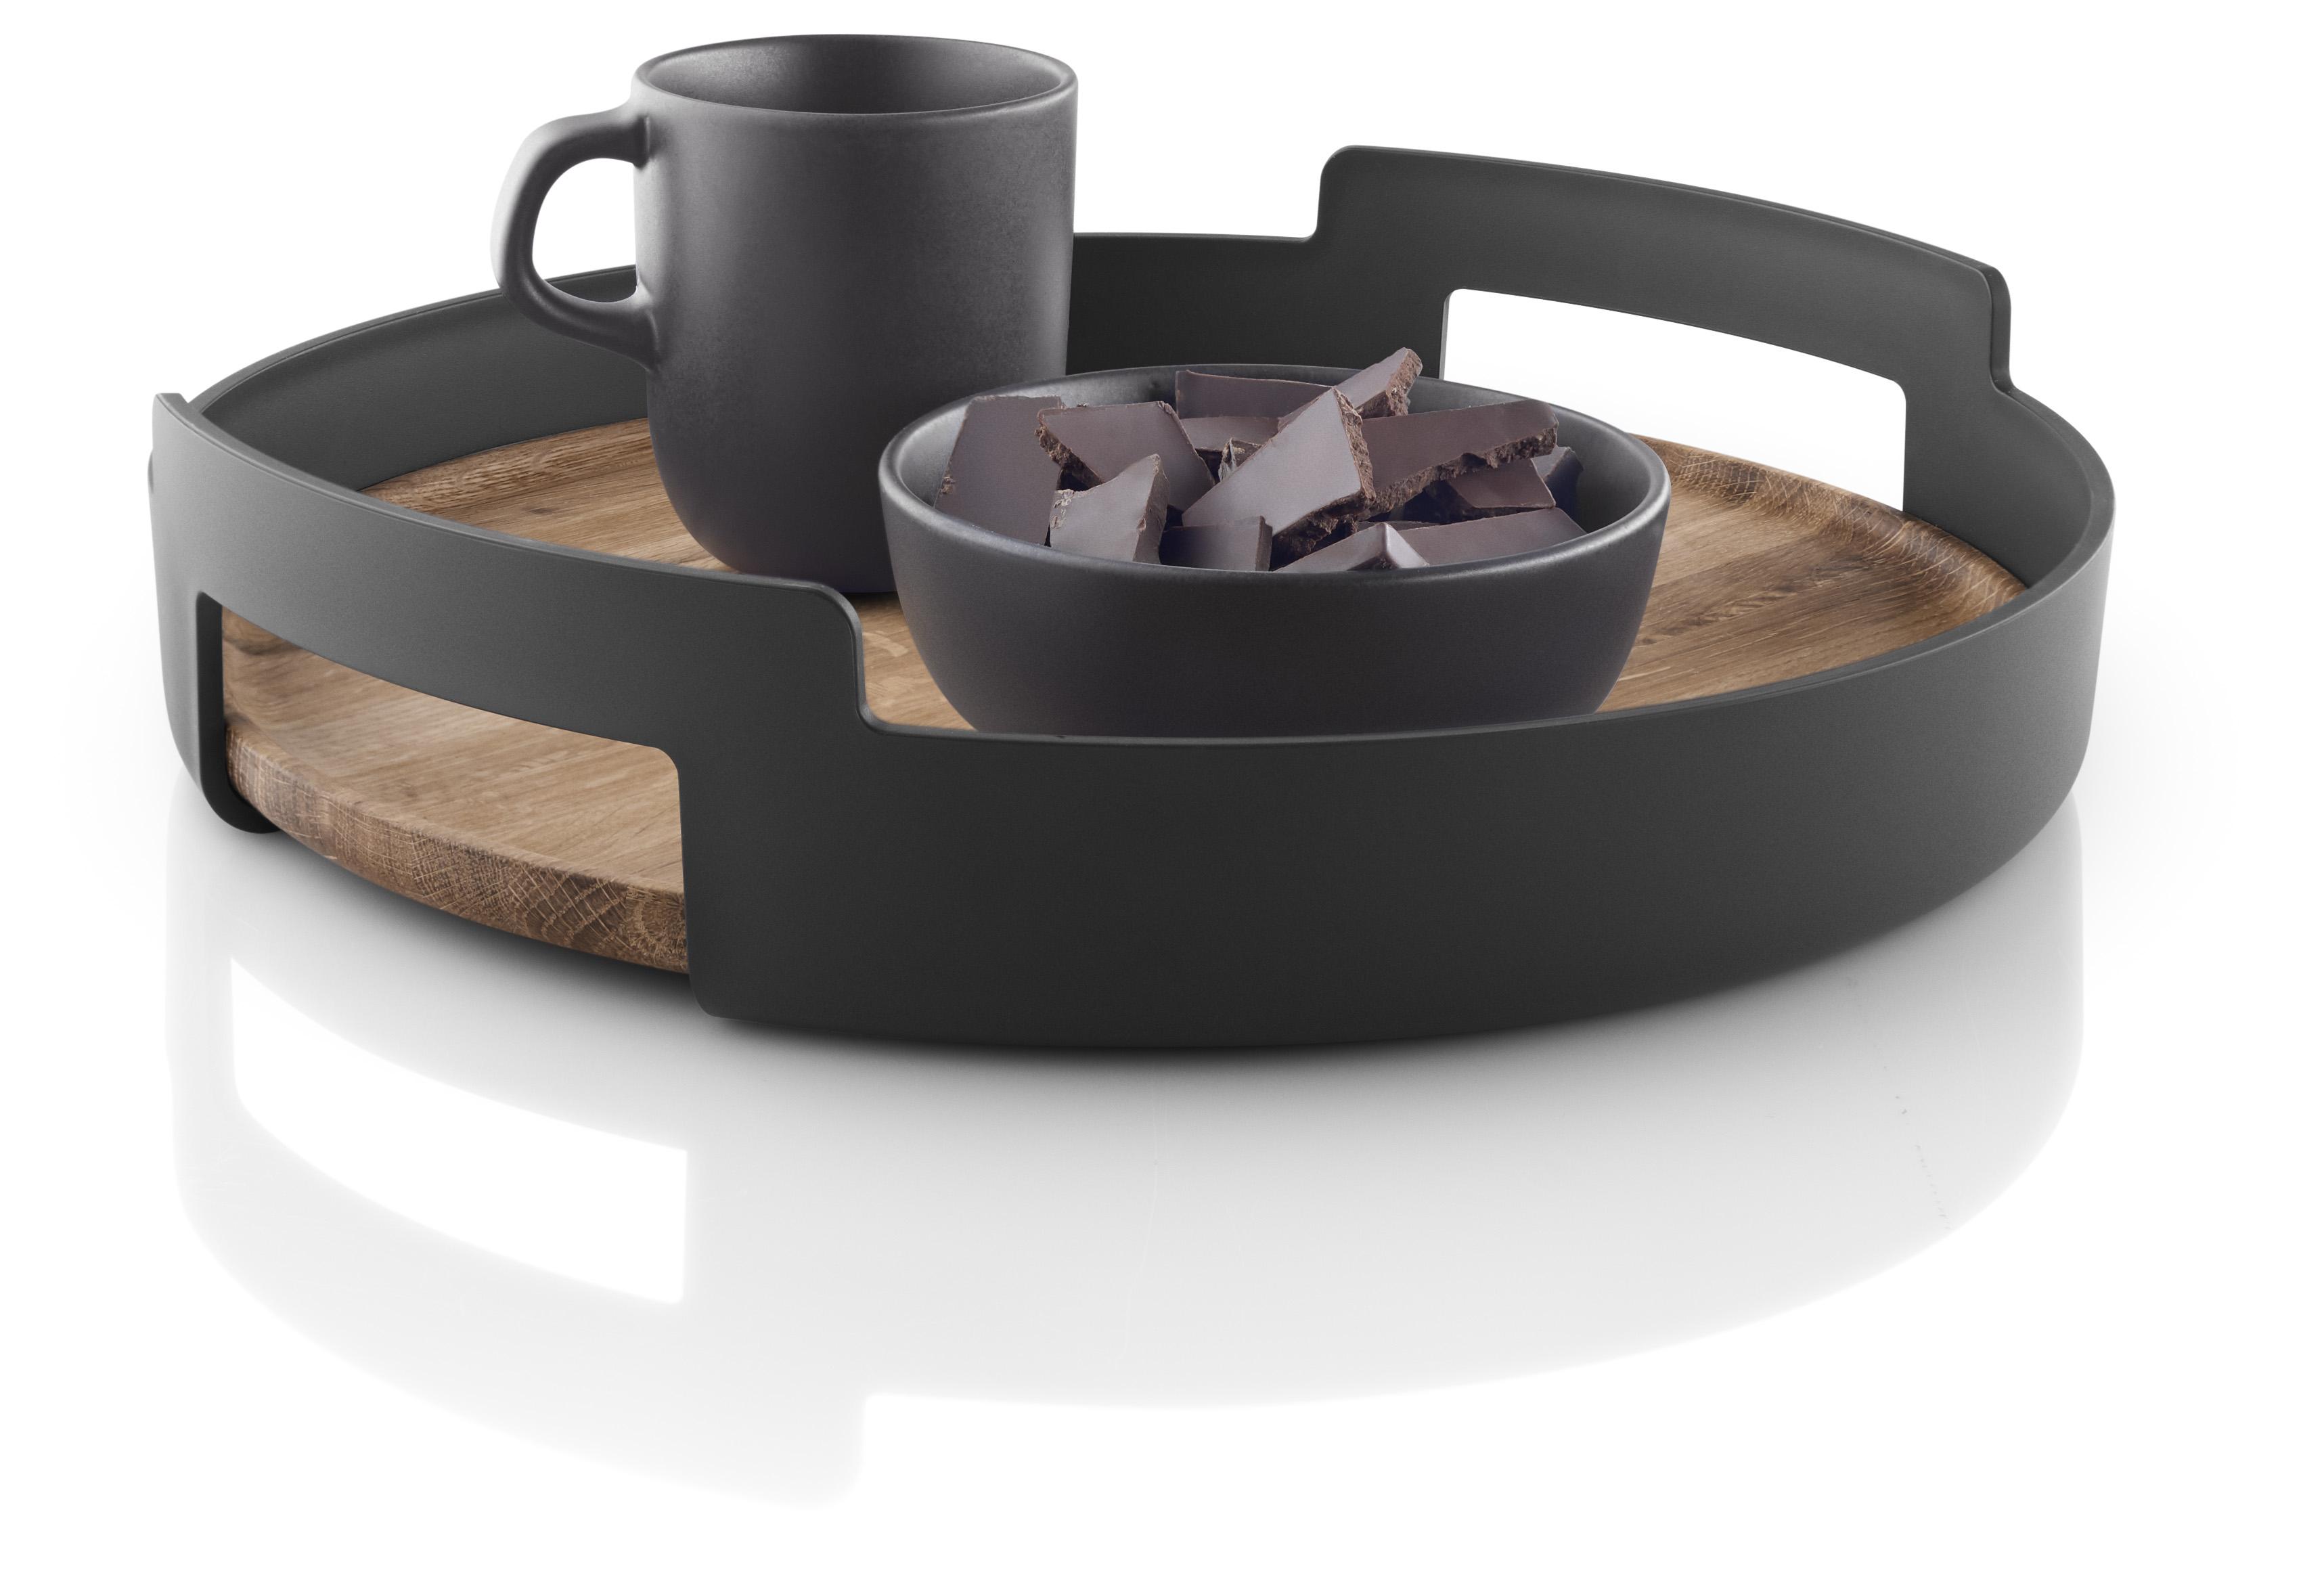 Eva Solo - Nordic Kitchen Serviertablett (520416)